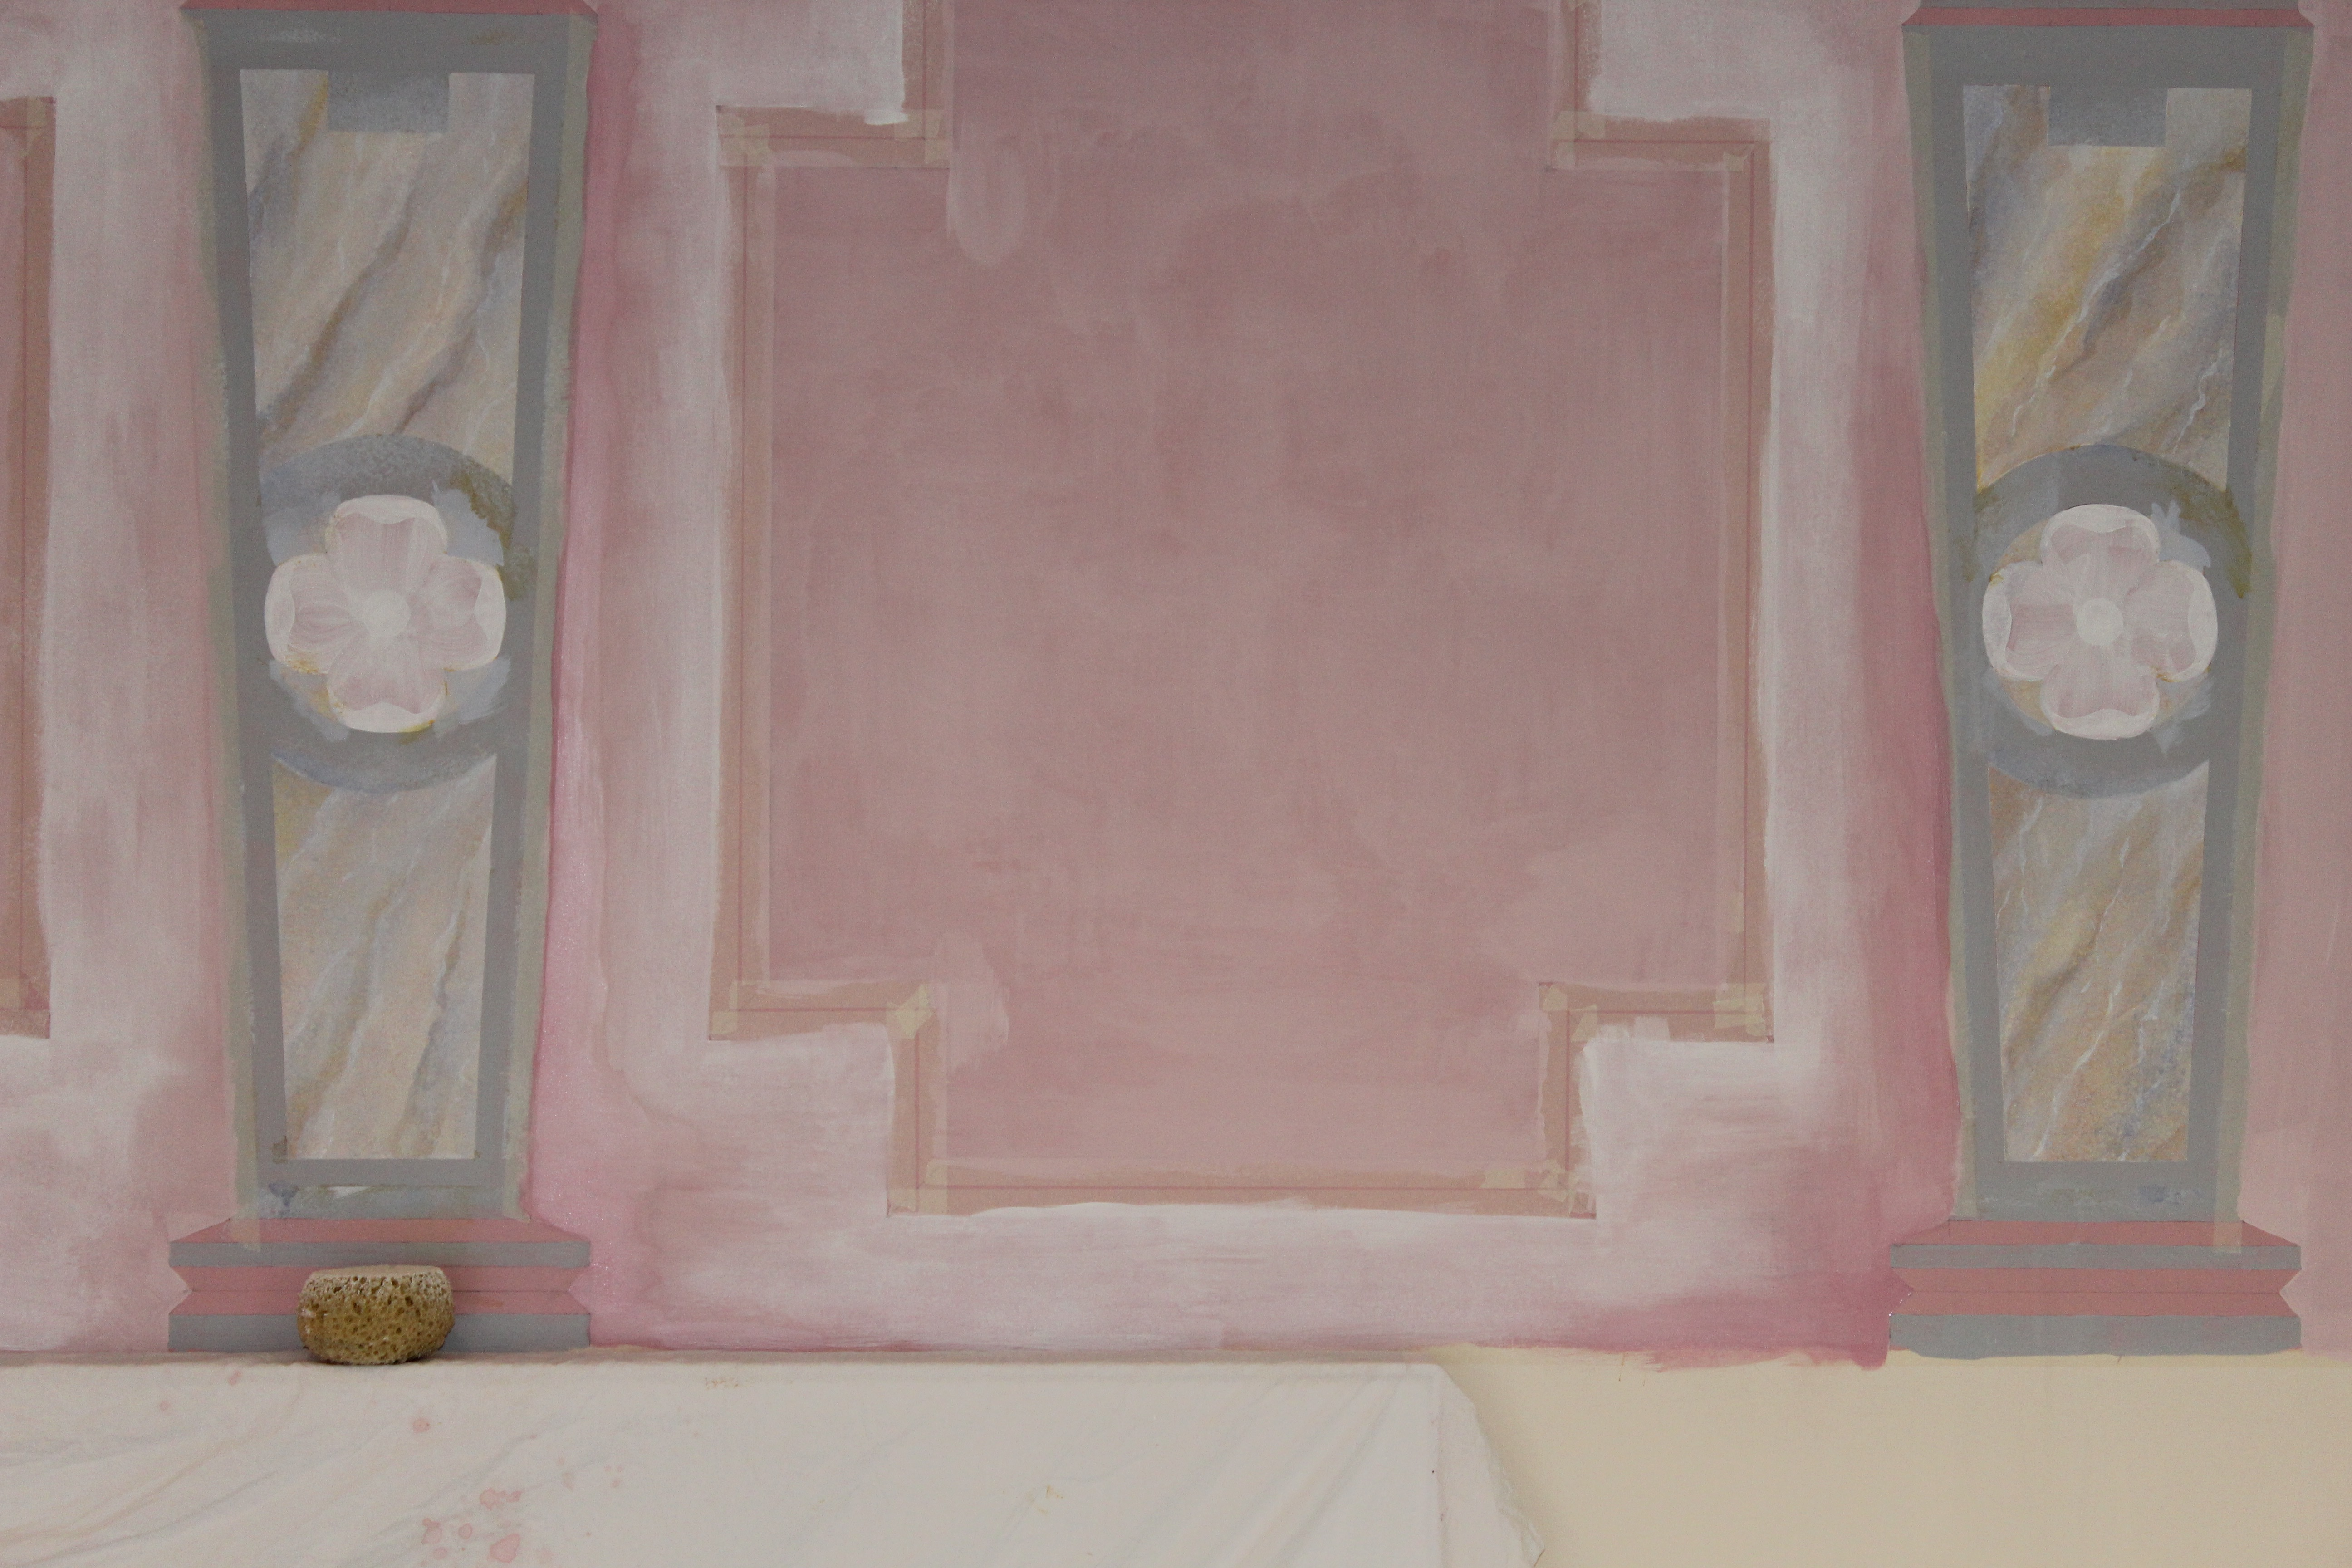 Pink wall detail